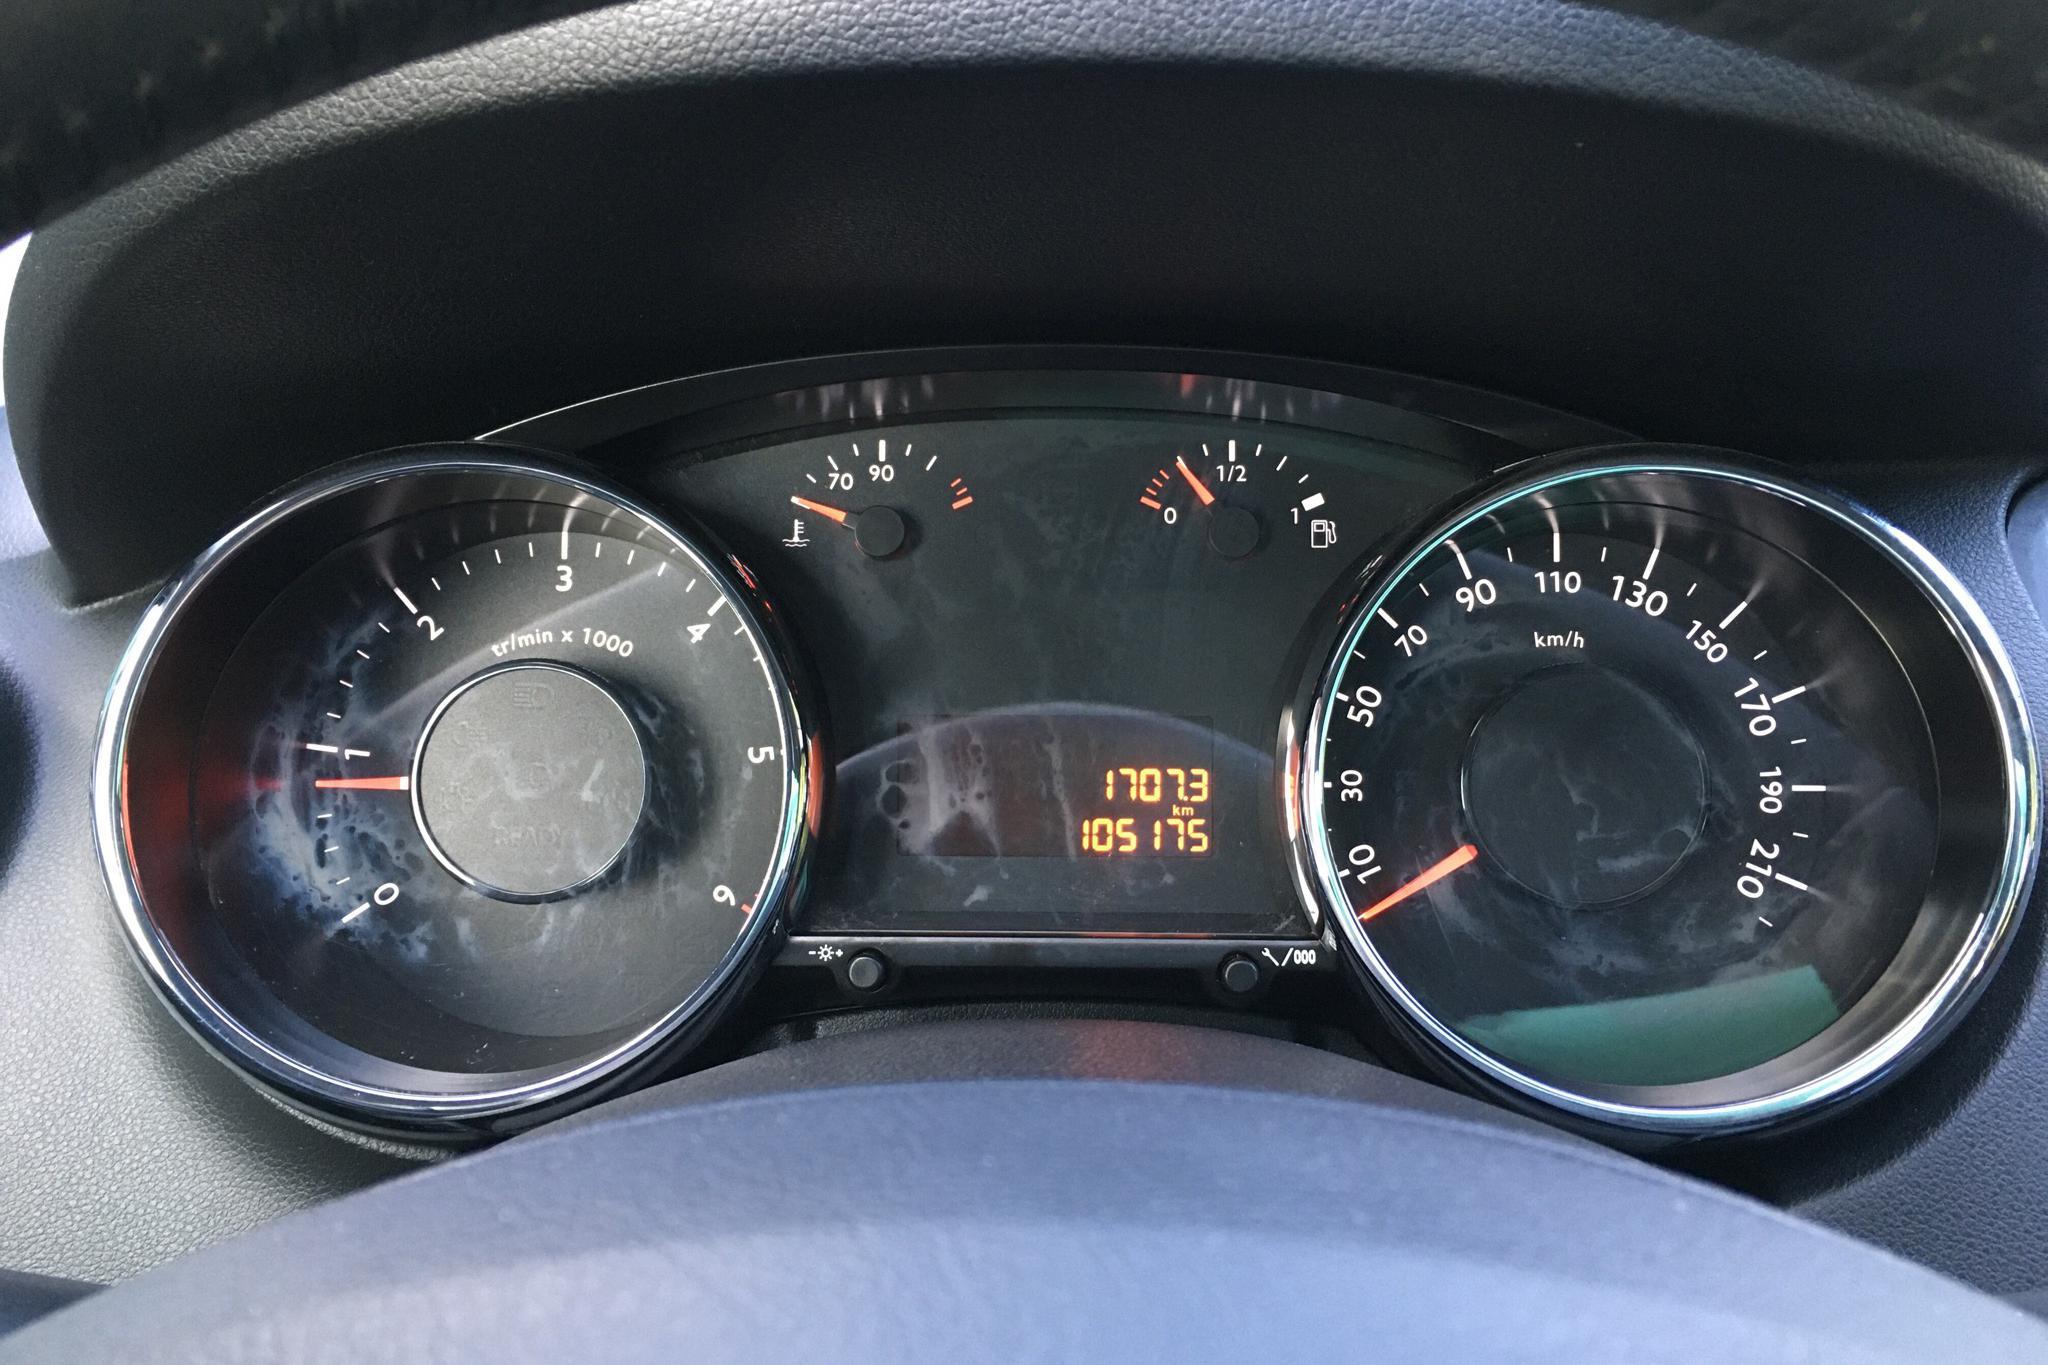 Peugeot 5008 1.6 HDI (115hk) - 10 517 mil - Manuell - Light Grey - 2014